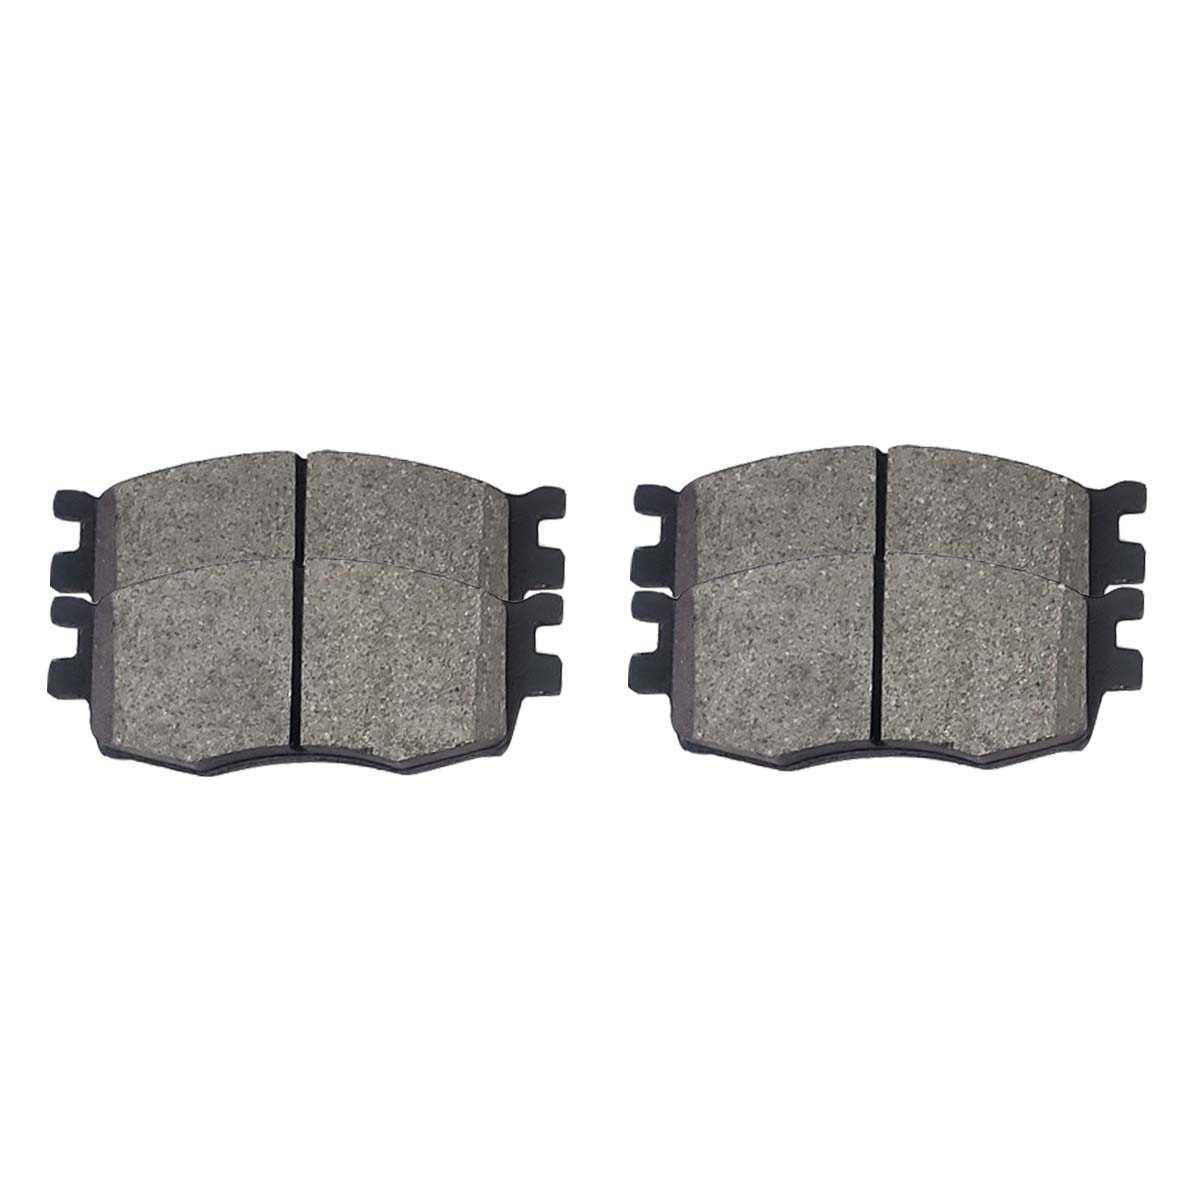 Prime Choice Auto Parts CAK663-664 Pair 2 Front Lower Control Arms